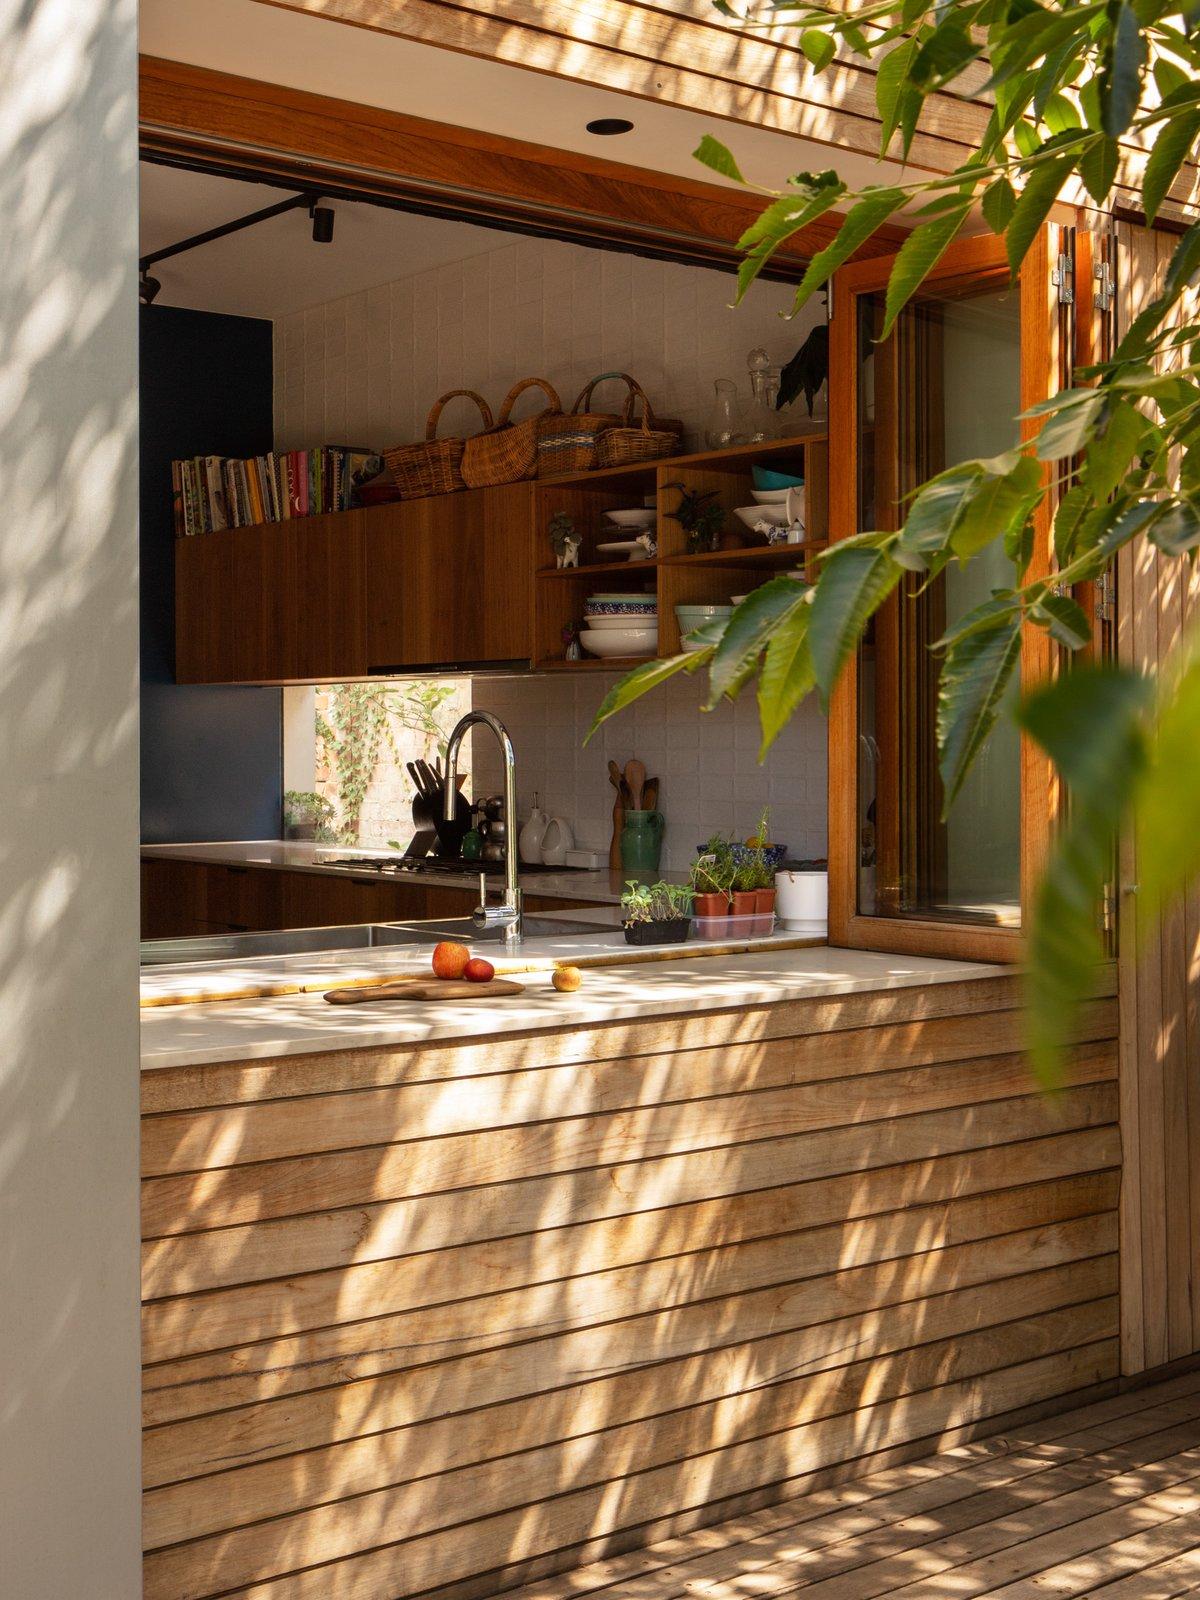 Elm Street House by Gardiner Architects Servery